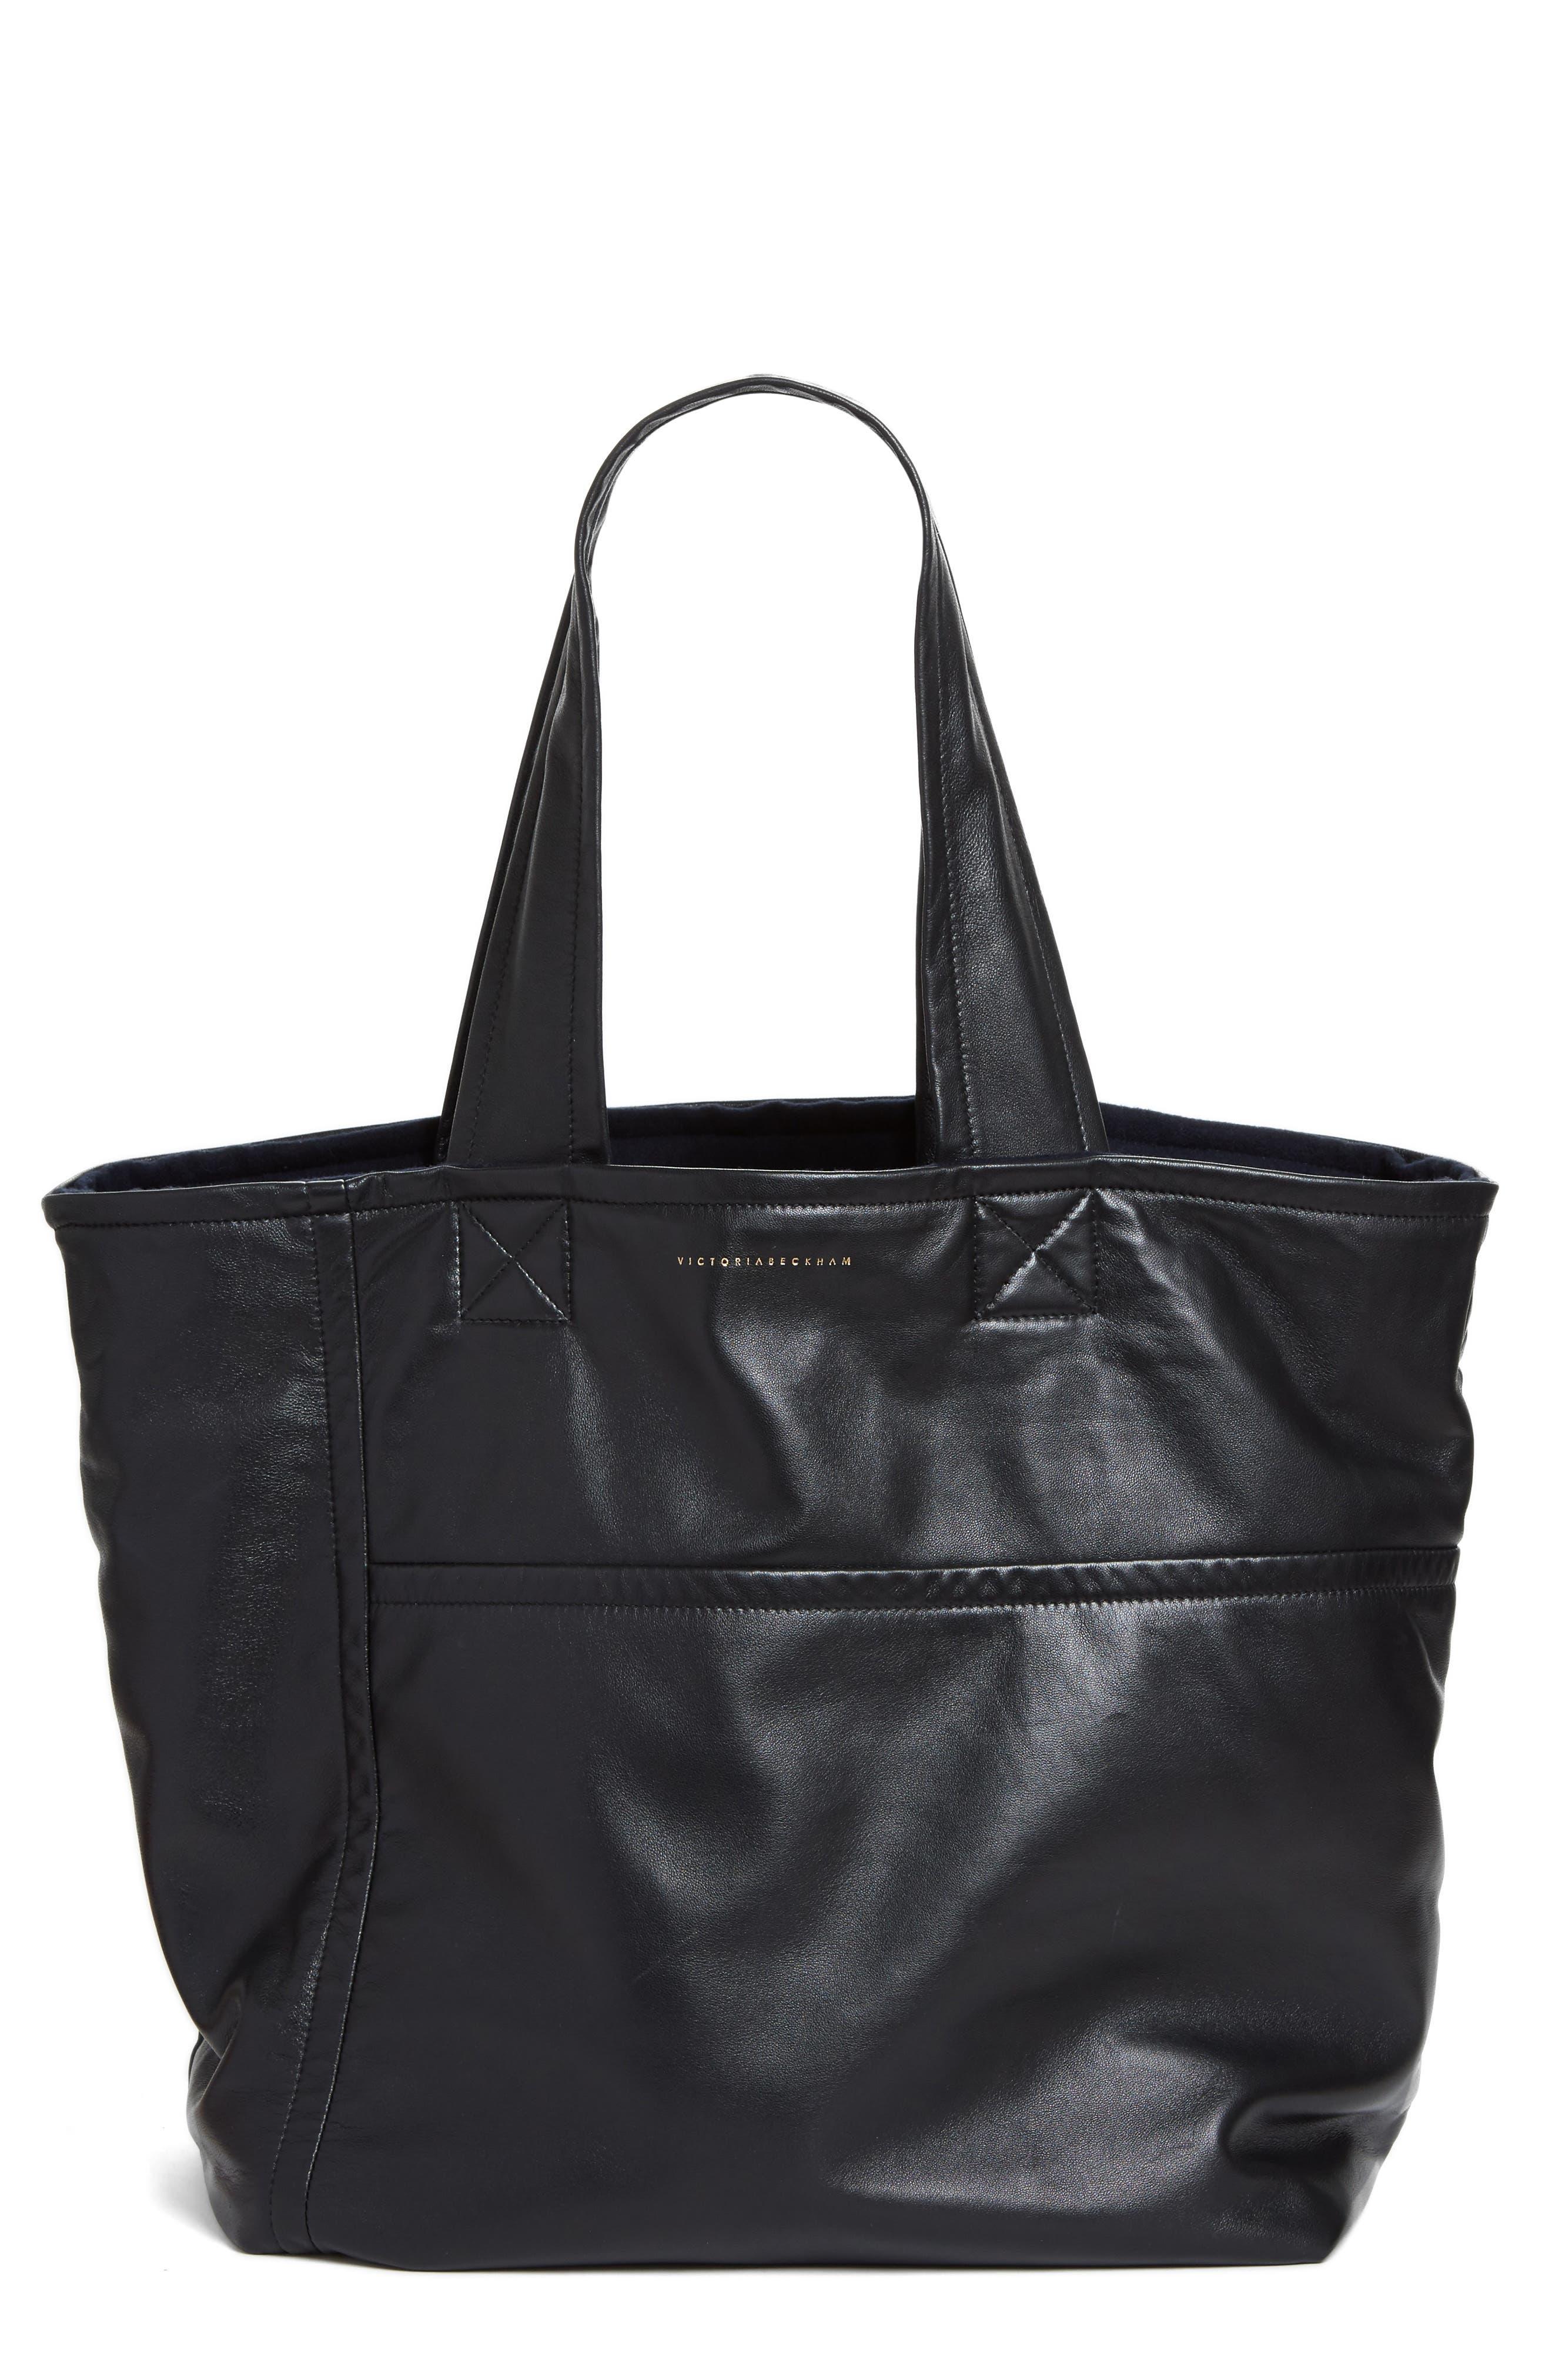 Sunday Bag,                         Main,                         color, Black